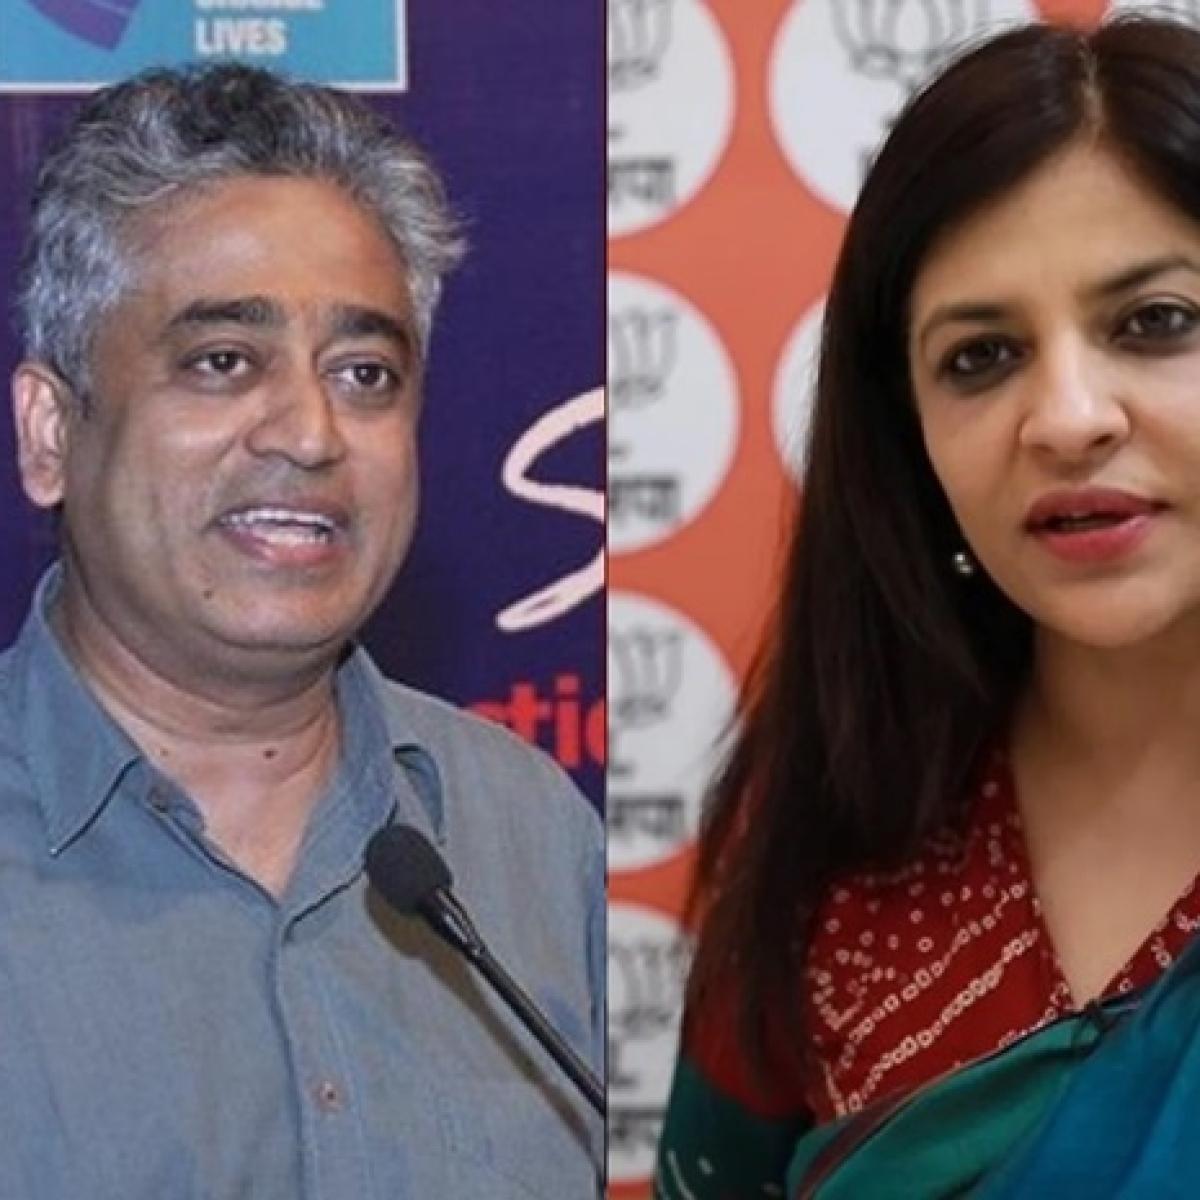 Shazia Ilmi slams Rajdeep Sardesai for sharing old video of Narendra Modi on 9/11 attack